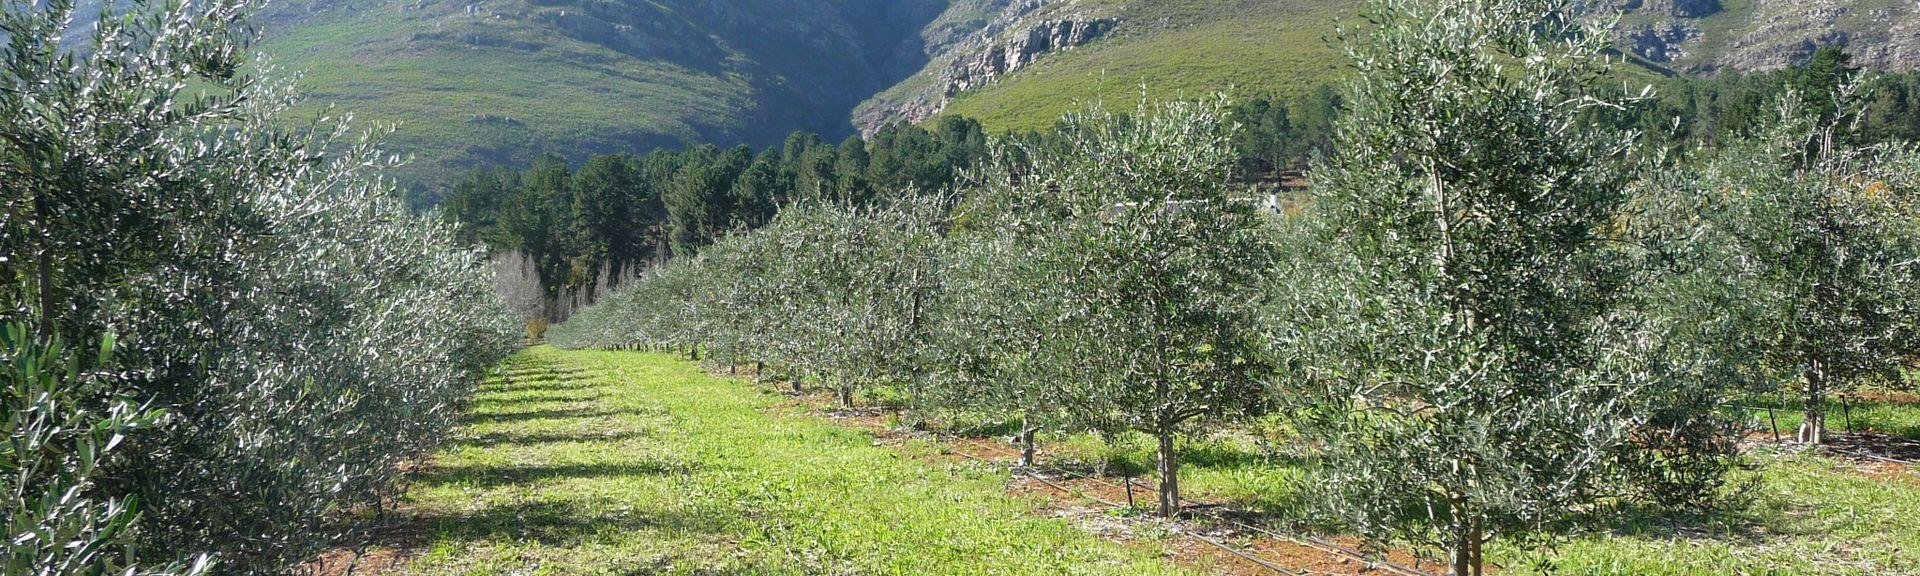 Stellenbosch, Cap-Occidental, Afrique du Sud